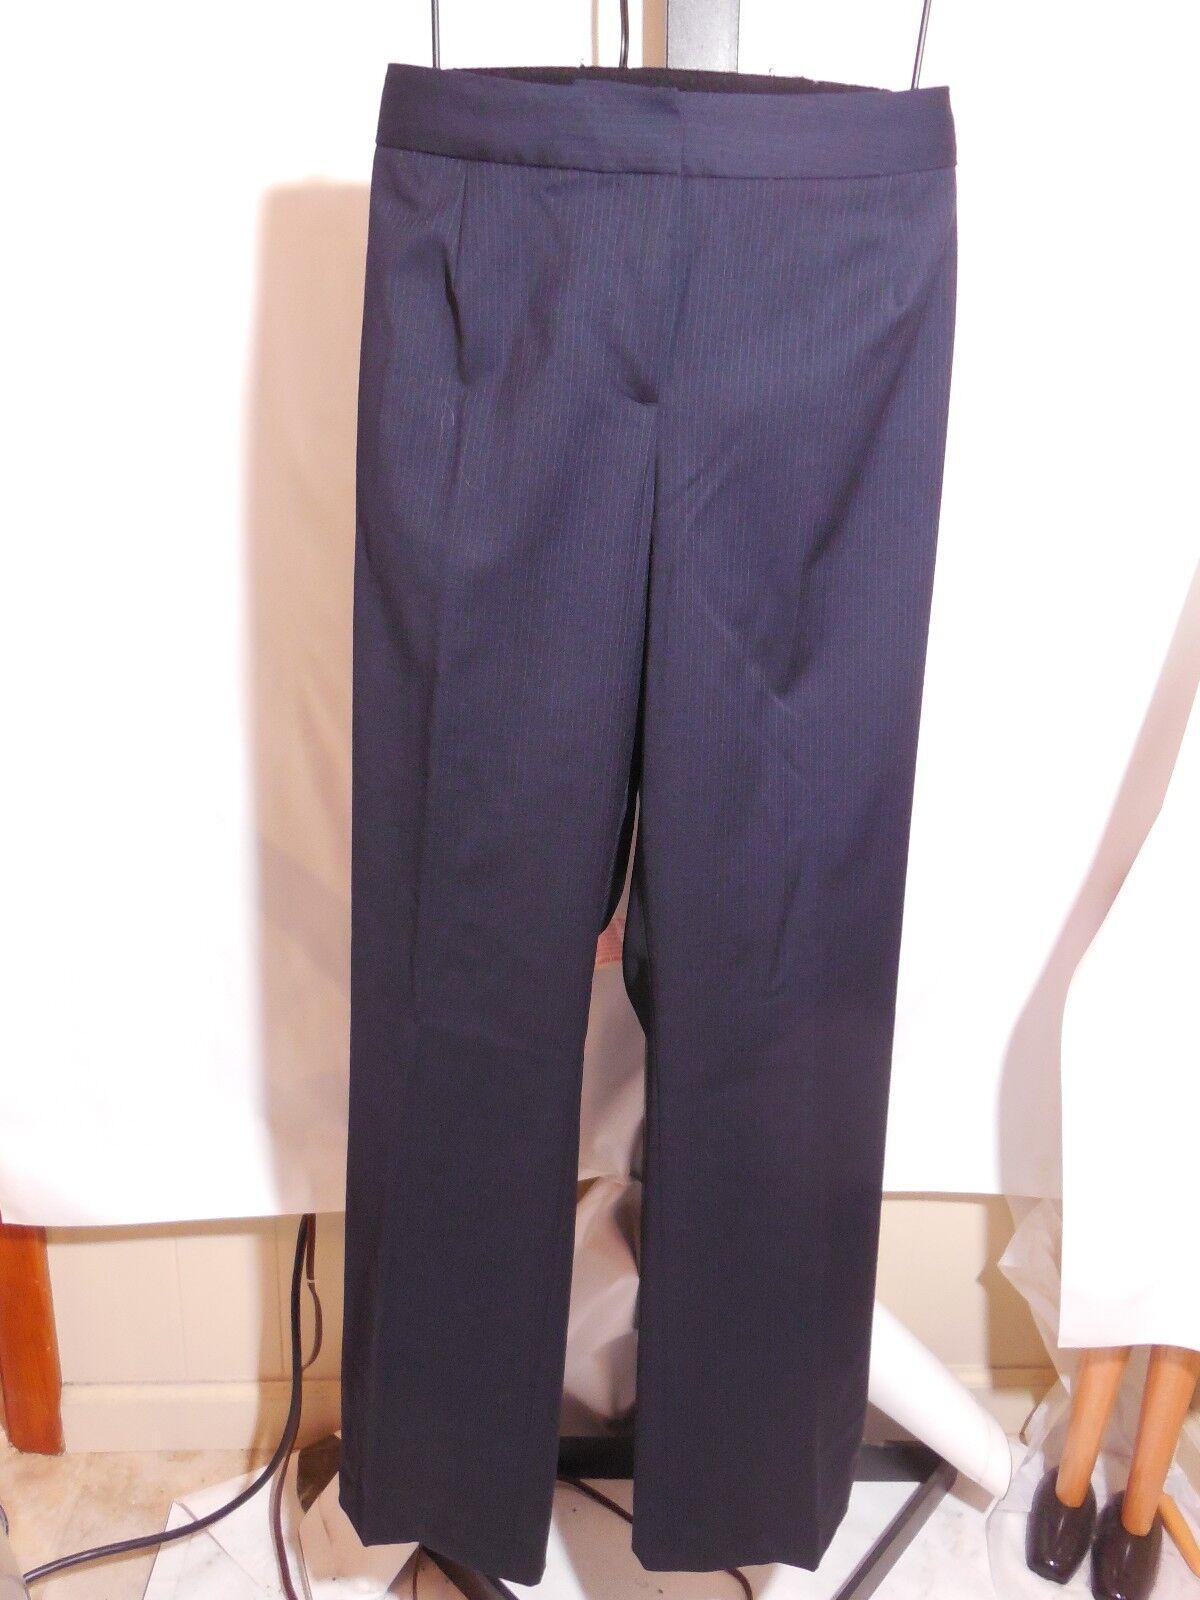 WOMANS blueE PIN STRIPE SEASONLESS WOOL SIGNATUR FIT PANTS TALBOTS PLUS 14W  139